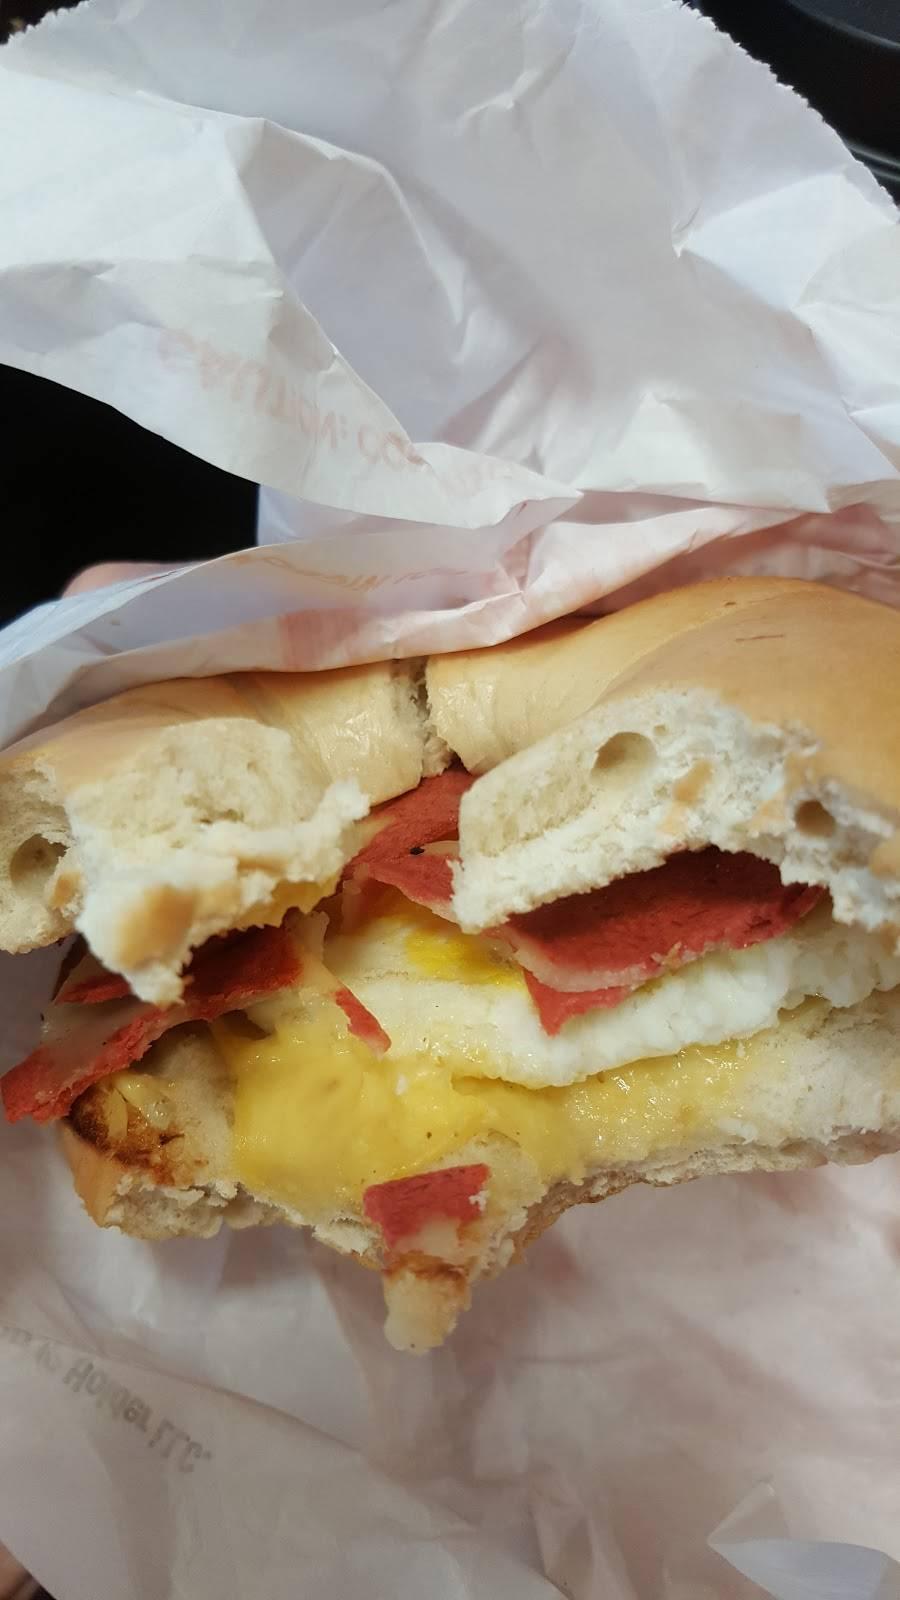 Dunkin Donuts | cafe | 934 Kings Hwy, Brooklyn, NY 11229, USA | 7186272450 OR +1 718-627-2450